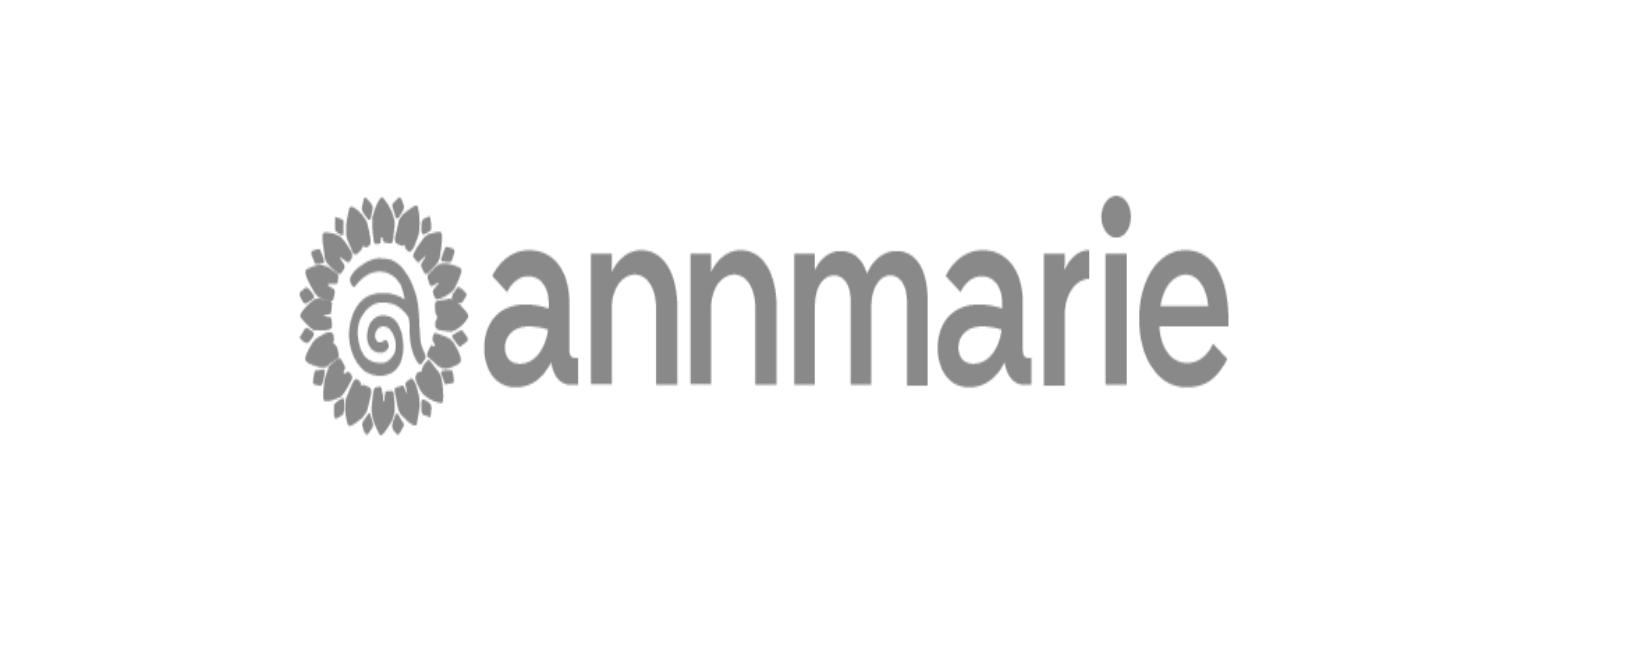 Annmarie Discount Code 2021